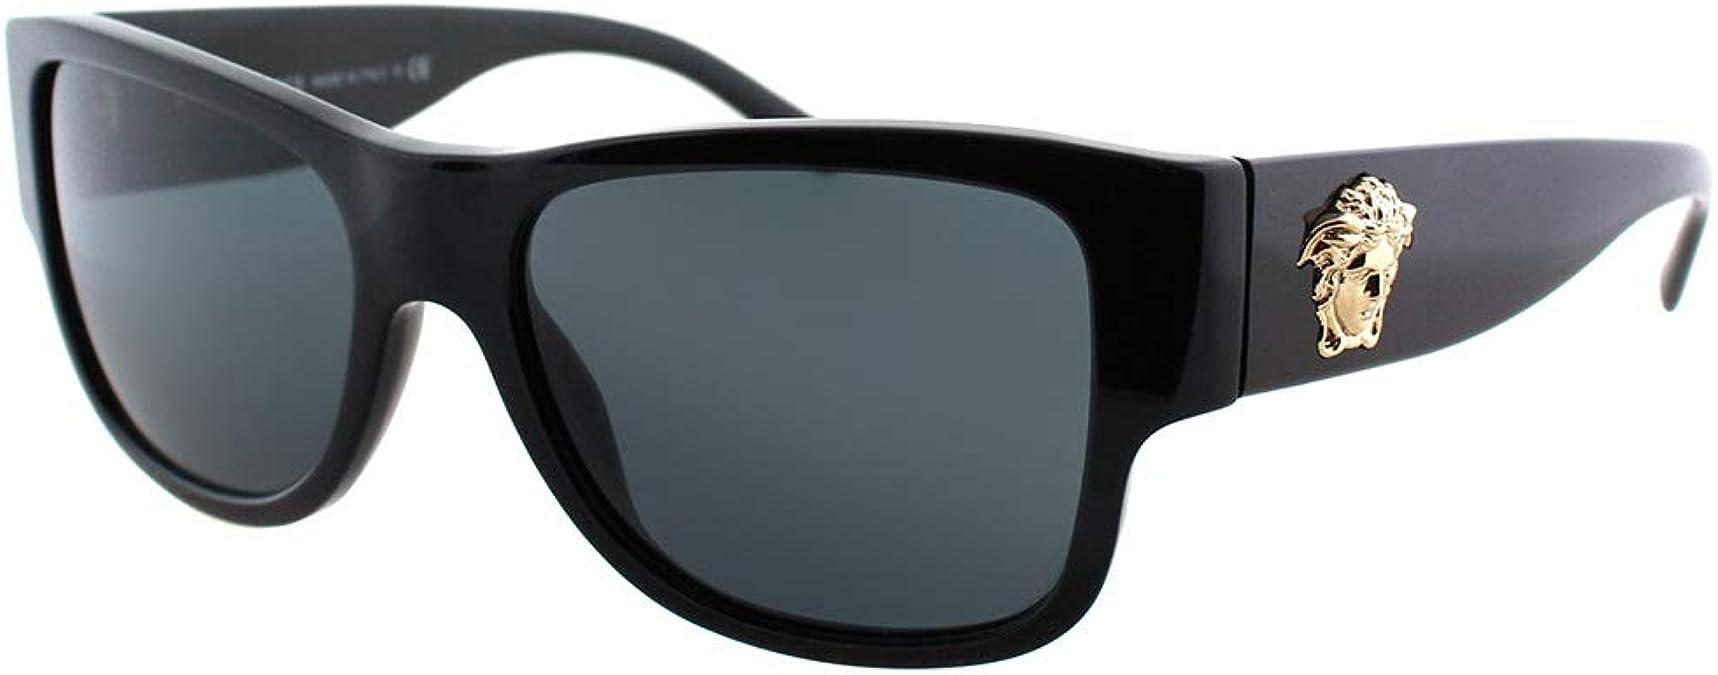 New Versace Black Hard Cell Eyeglasses Case